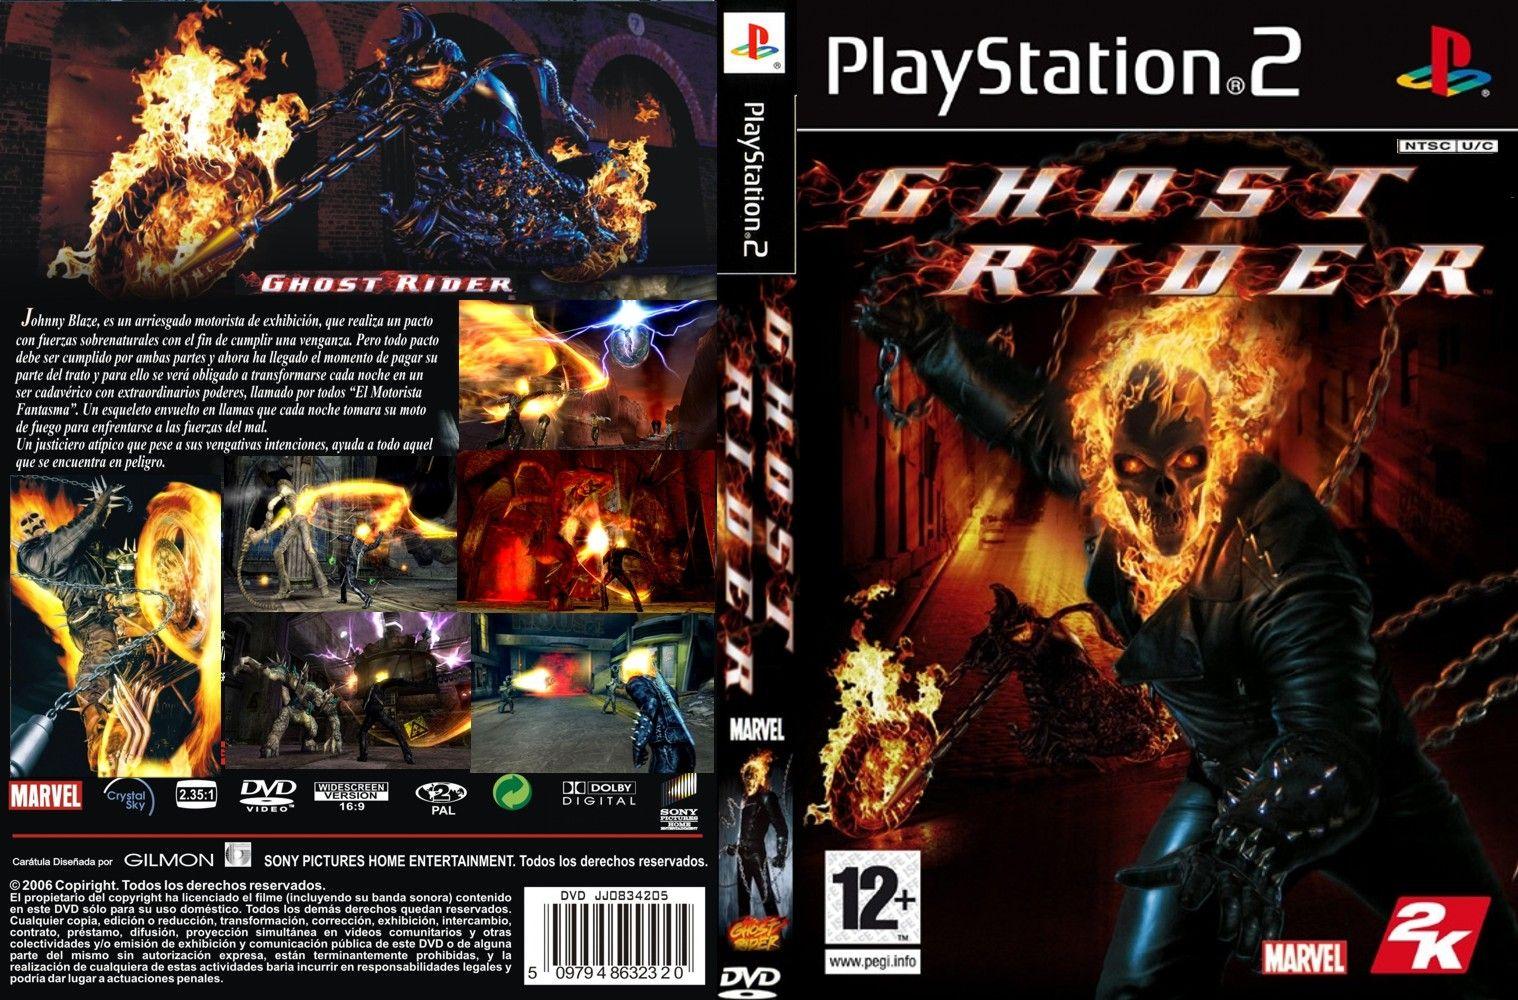 Ghost rider sextoons porno tube